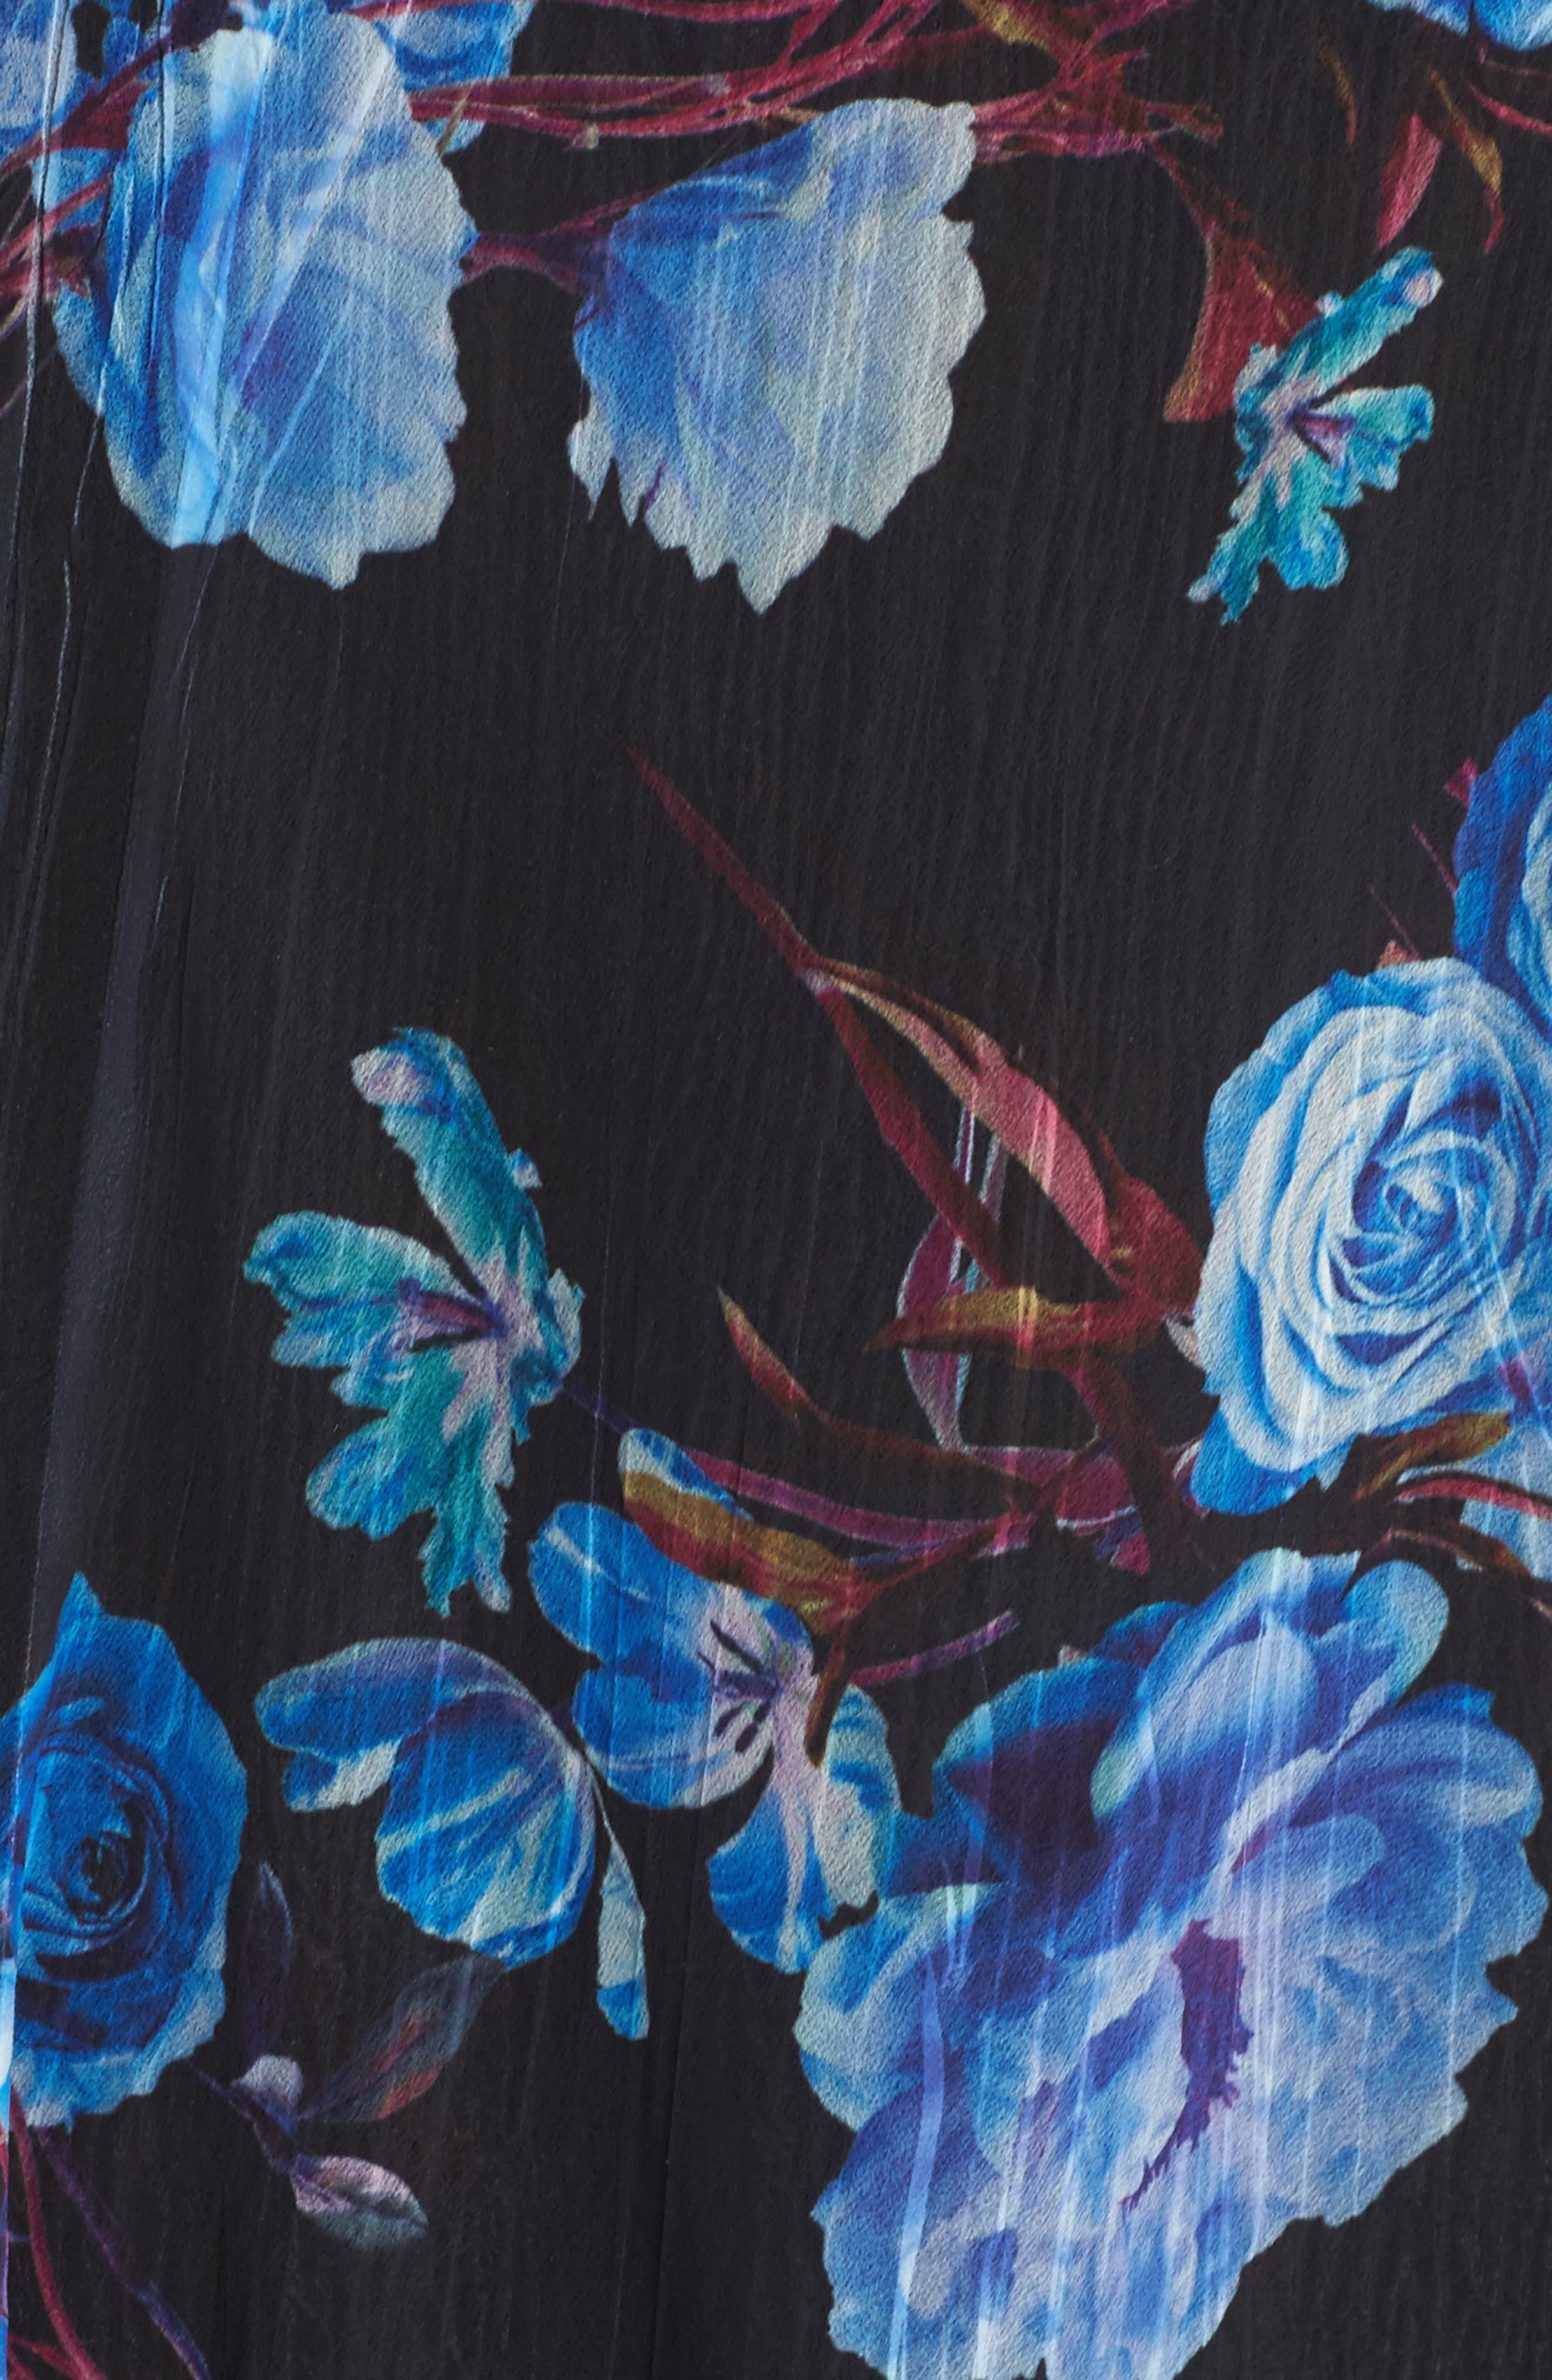 Floral Charmeuse & Chiffon A-Line Dress,                             Alternate thumbnail 5, color,                             Midnight Aurora